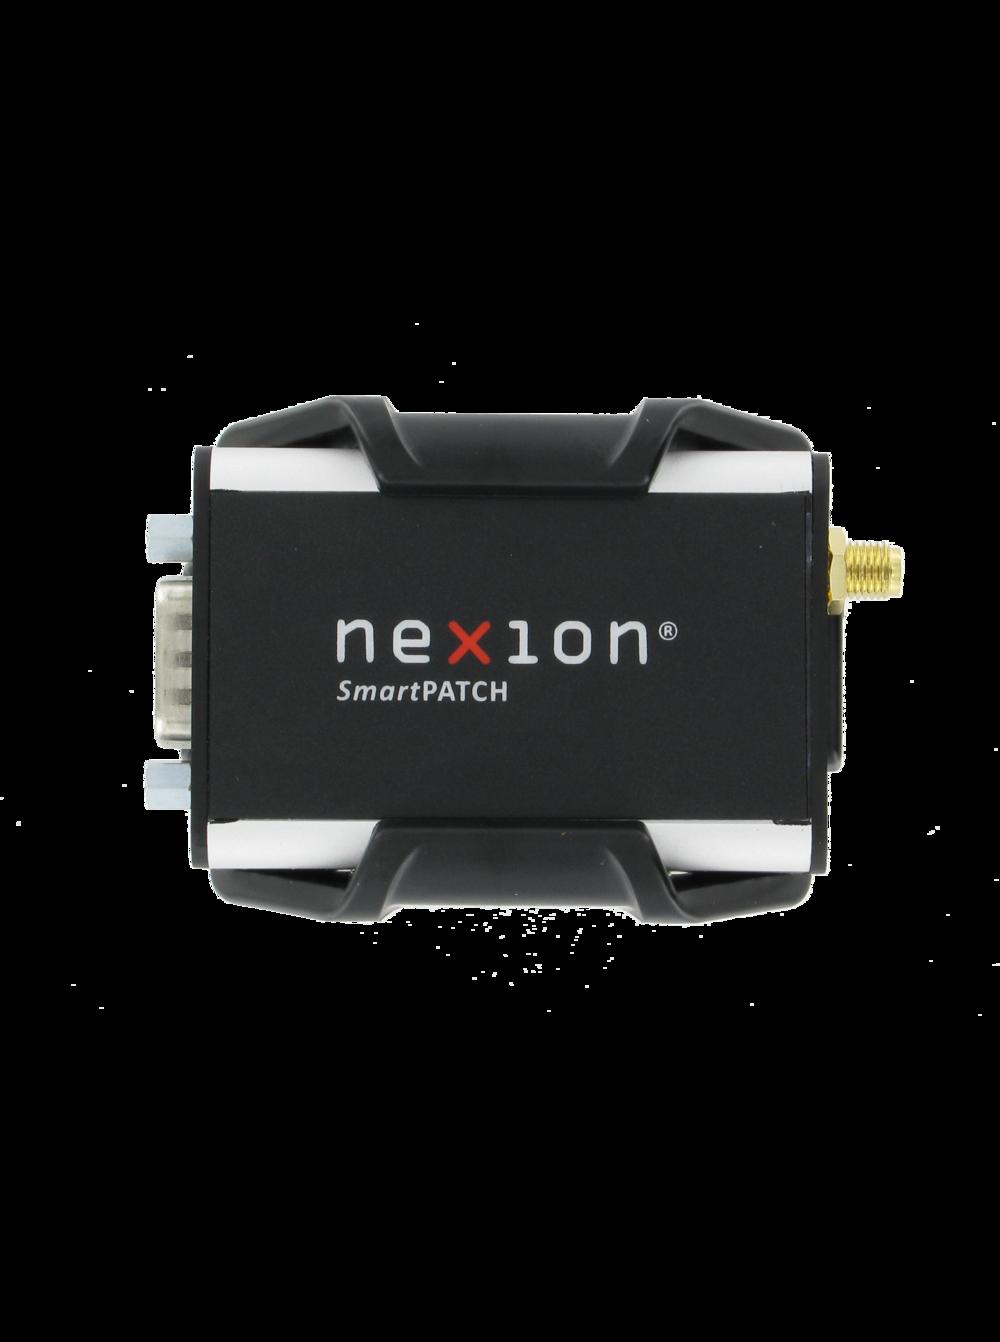 NEXION NX6300